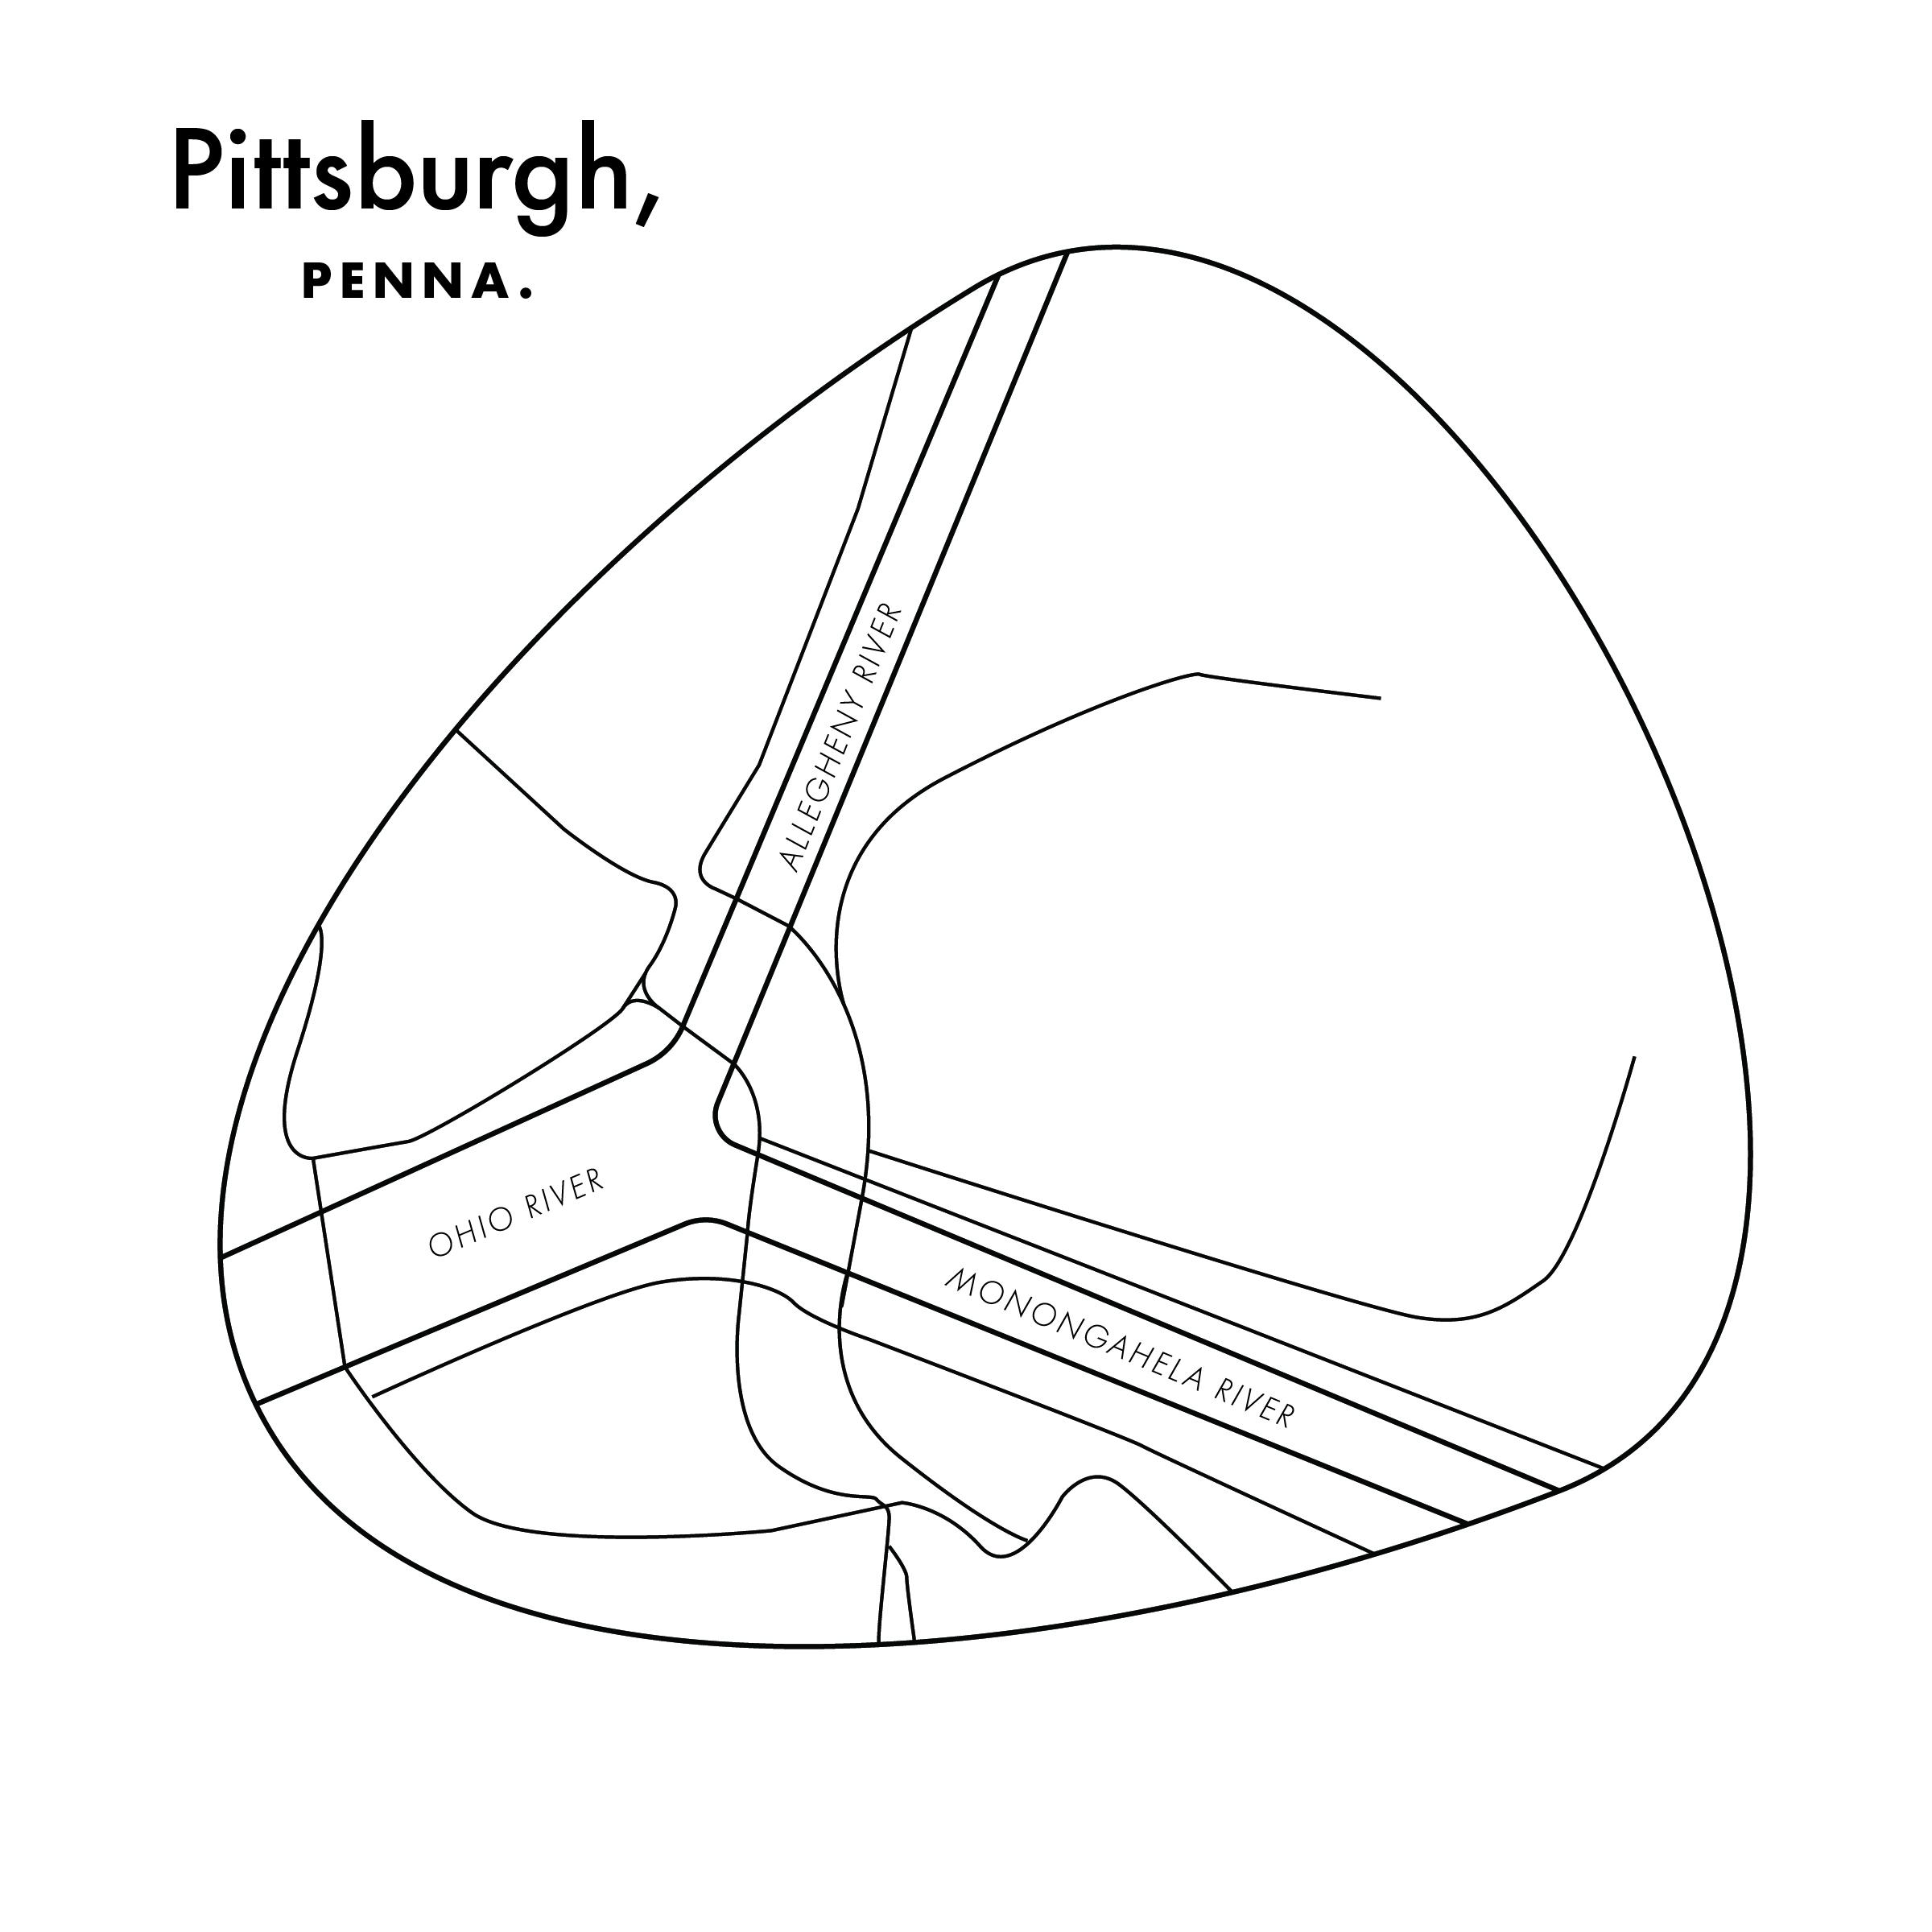 map-pittsburgh-v5-01.jpg